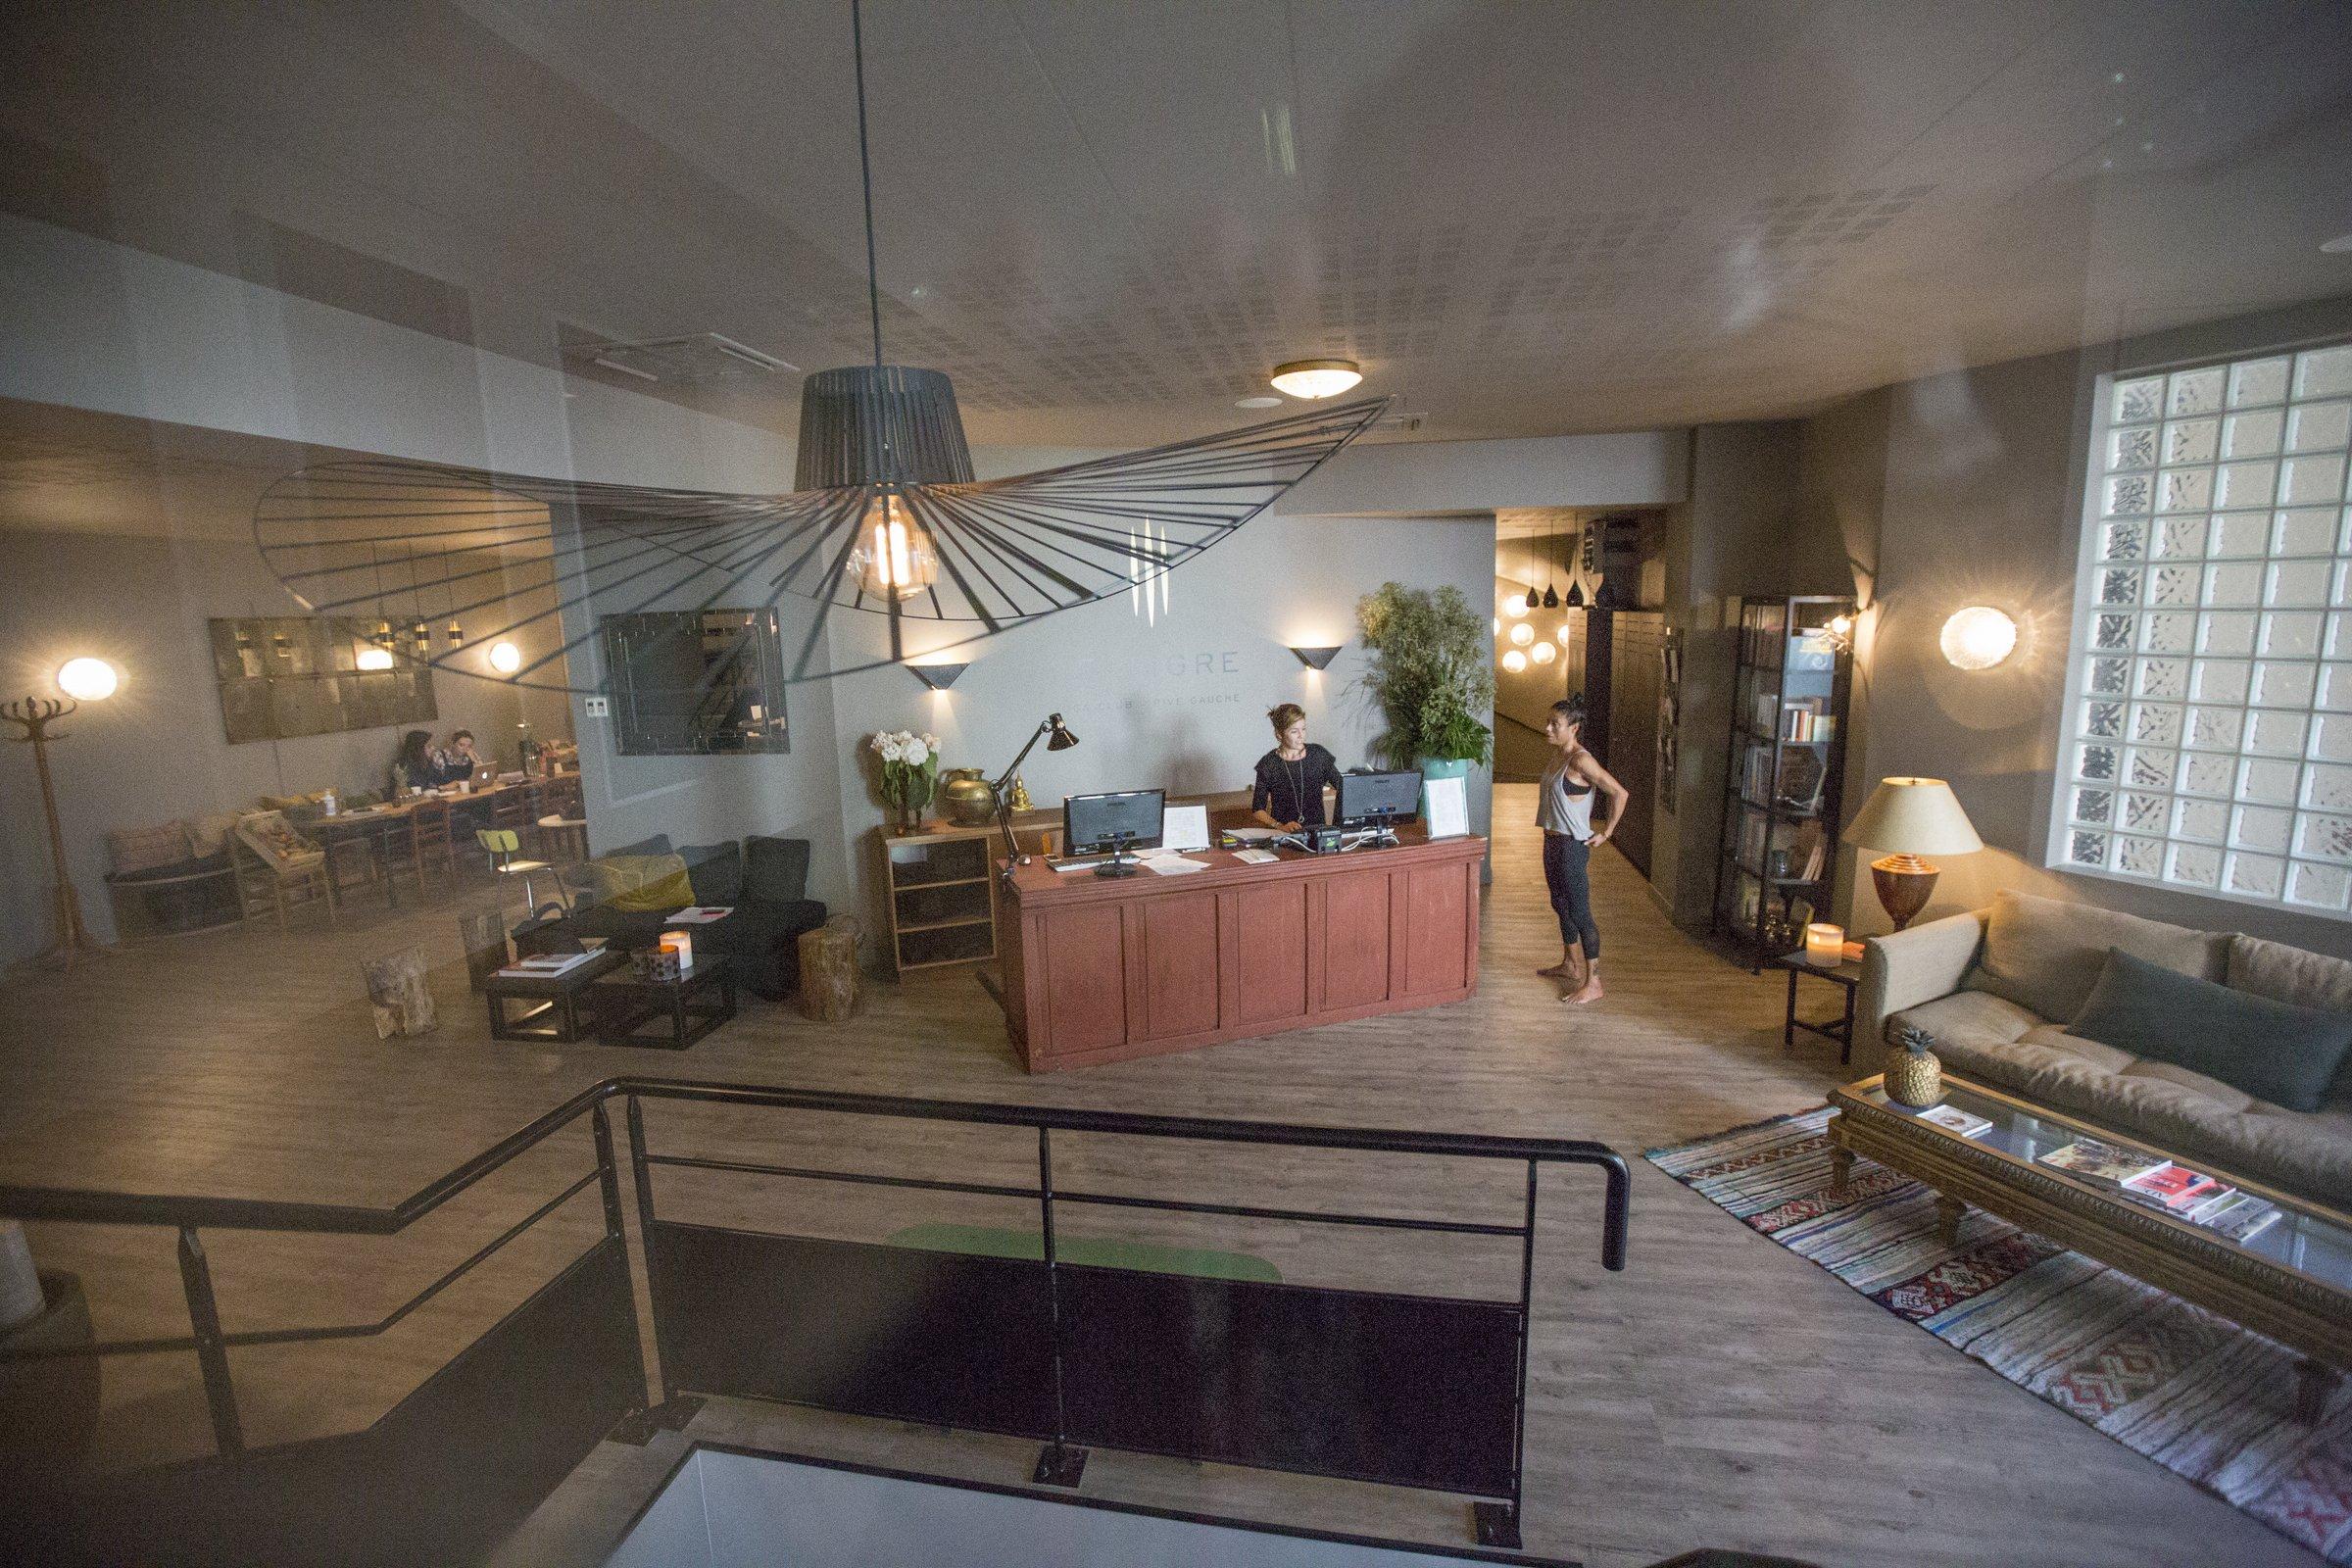 from bikram to vinyasa flow paris 39 best yoga studios hip paris blog hip paris blog. Black Bedroom Furniture Sets. Home Design Ideas